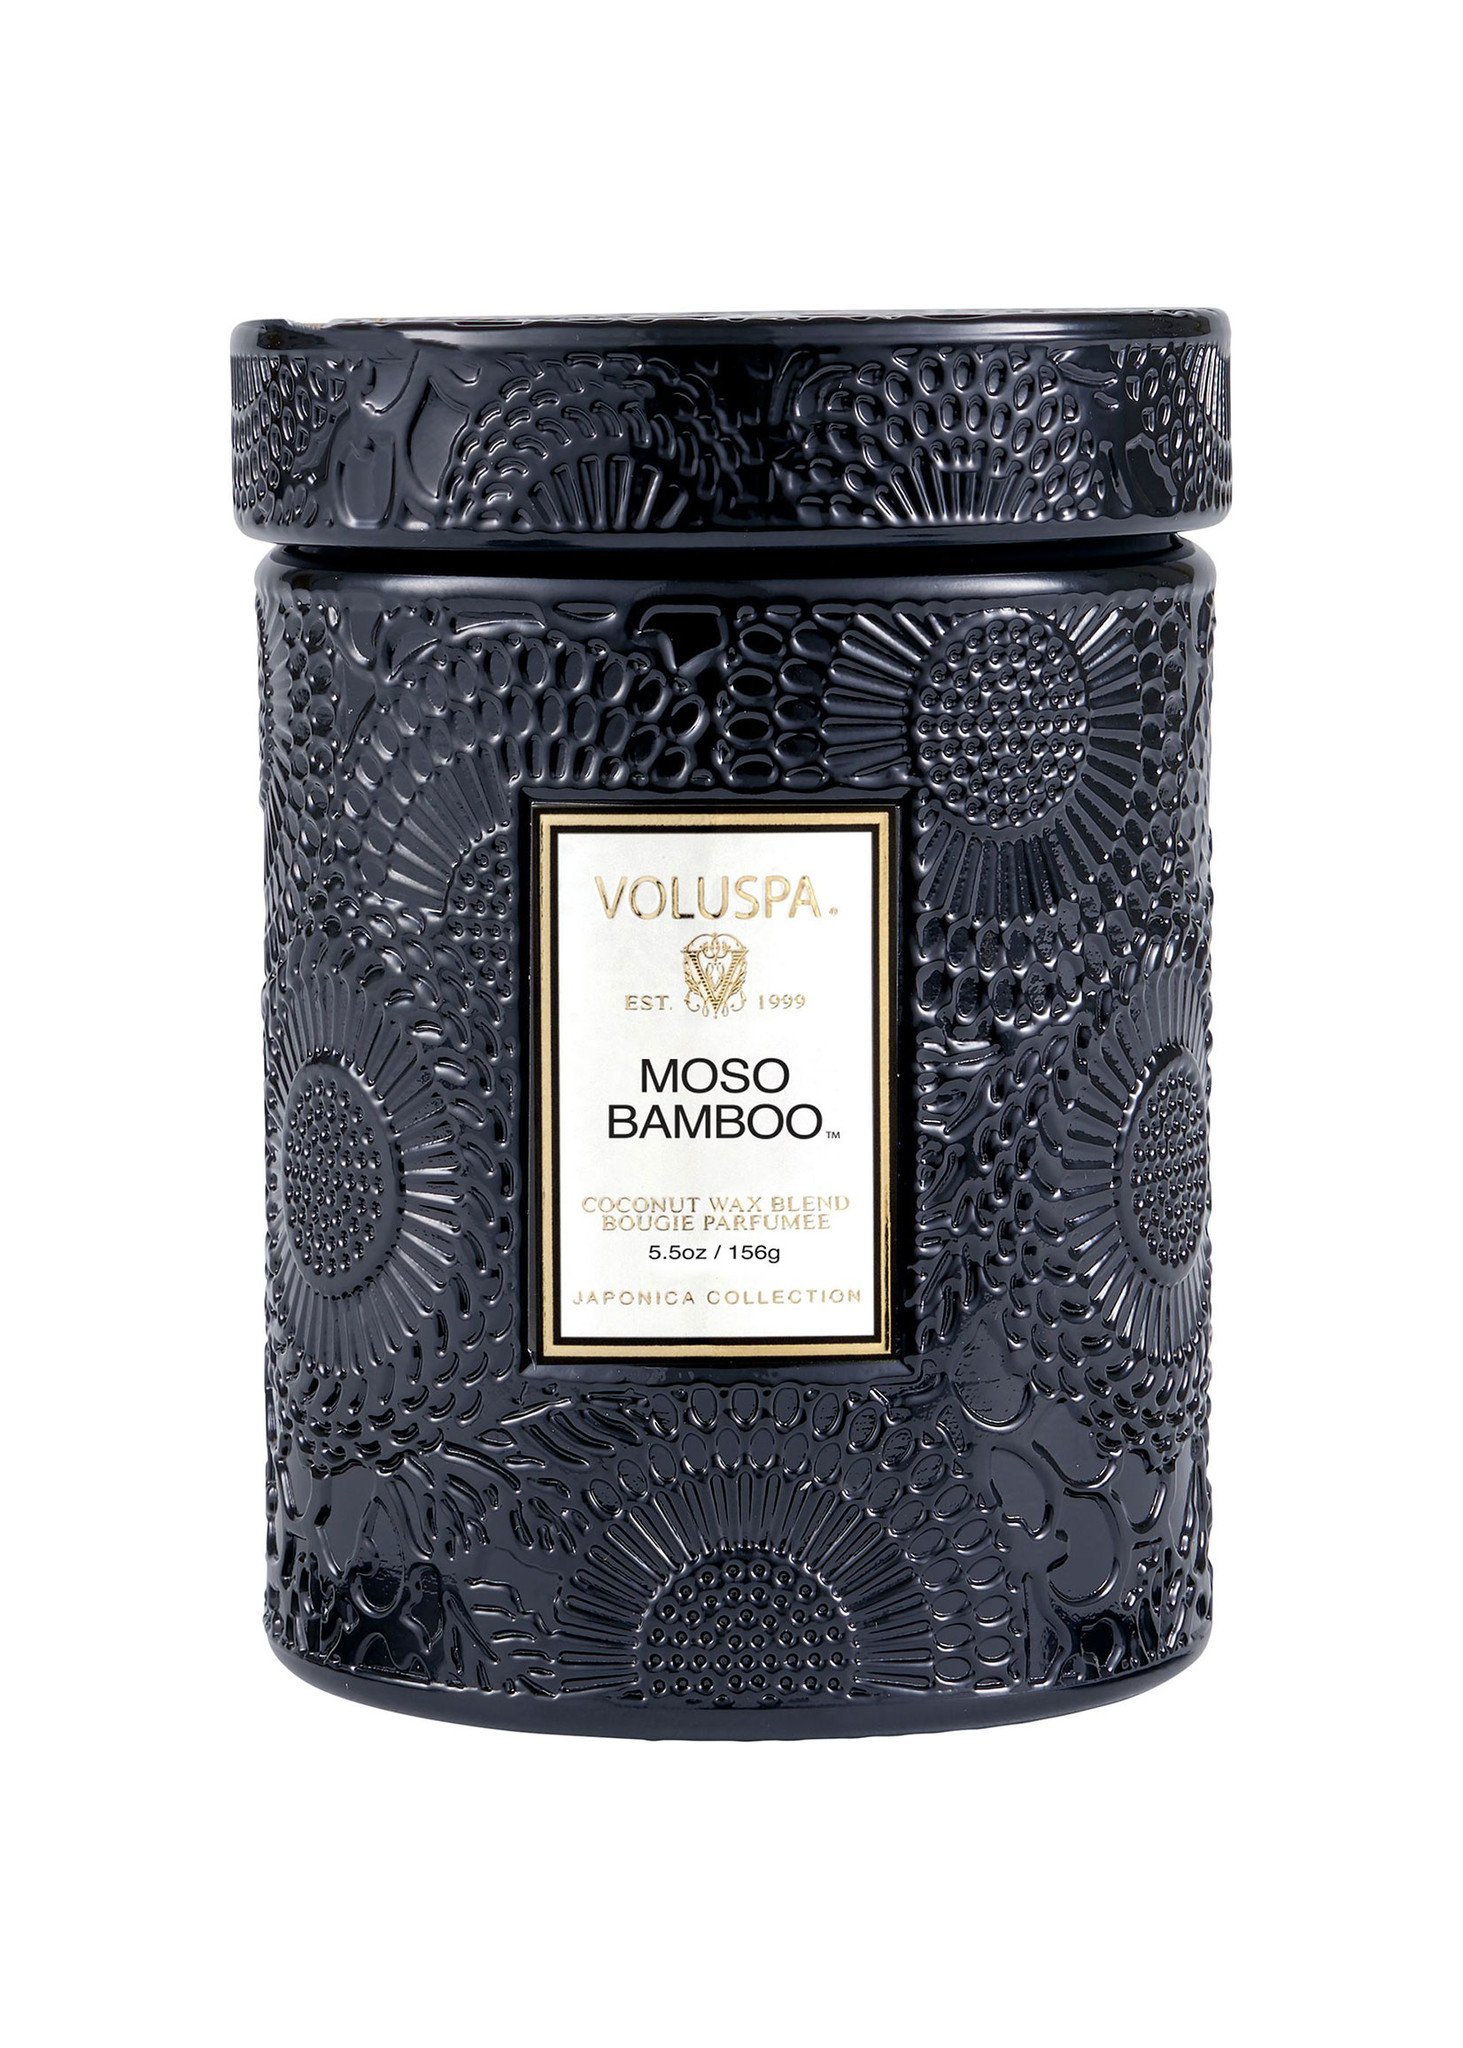 Moso Bamboo Small Jar Candle-1